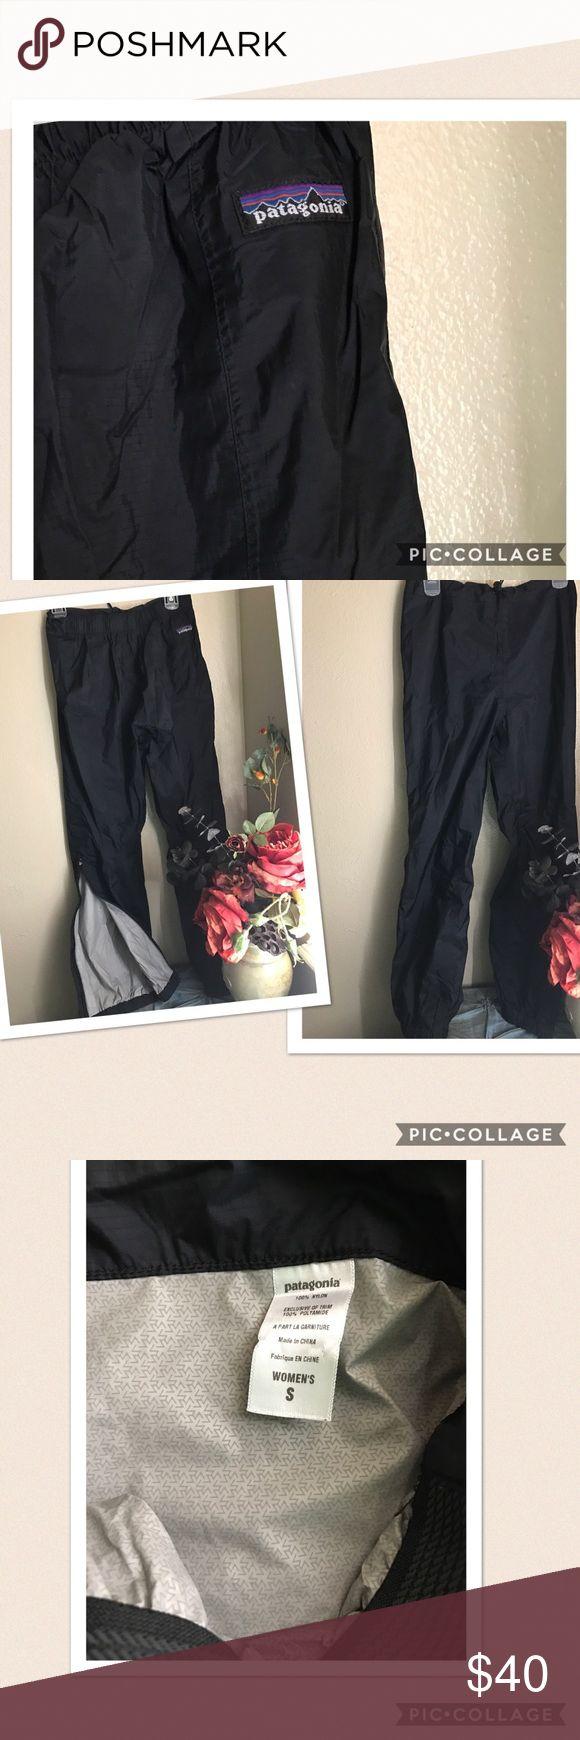 "🆕 Women's Patagonia Rain Ski Shell Pants Nylon 🆕 Women's Patagonia Rain Ski Snow Shell Pants. Side zipper closure. Pull cord at waistband. Material: 💯% nylon. Size: Small. Length: 40"", Seam: 29"". Color: Black. New without tag. Patagonia Pants"